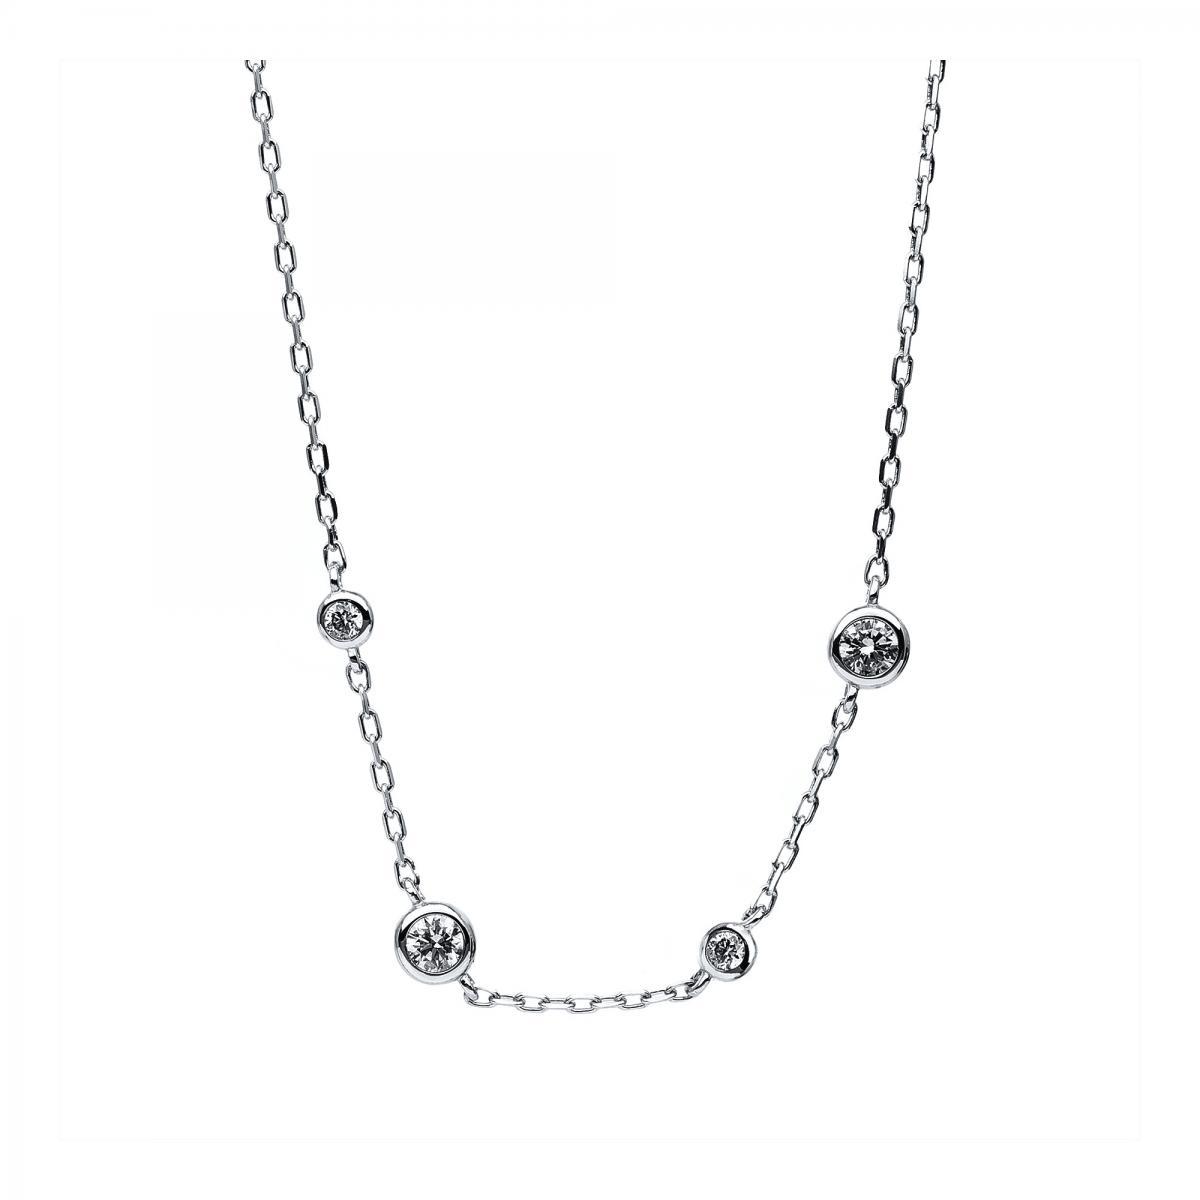 Necklace 14 ct white gold with brilliants ca. 0,16/ca. 0,05 ct